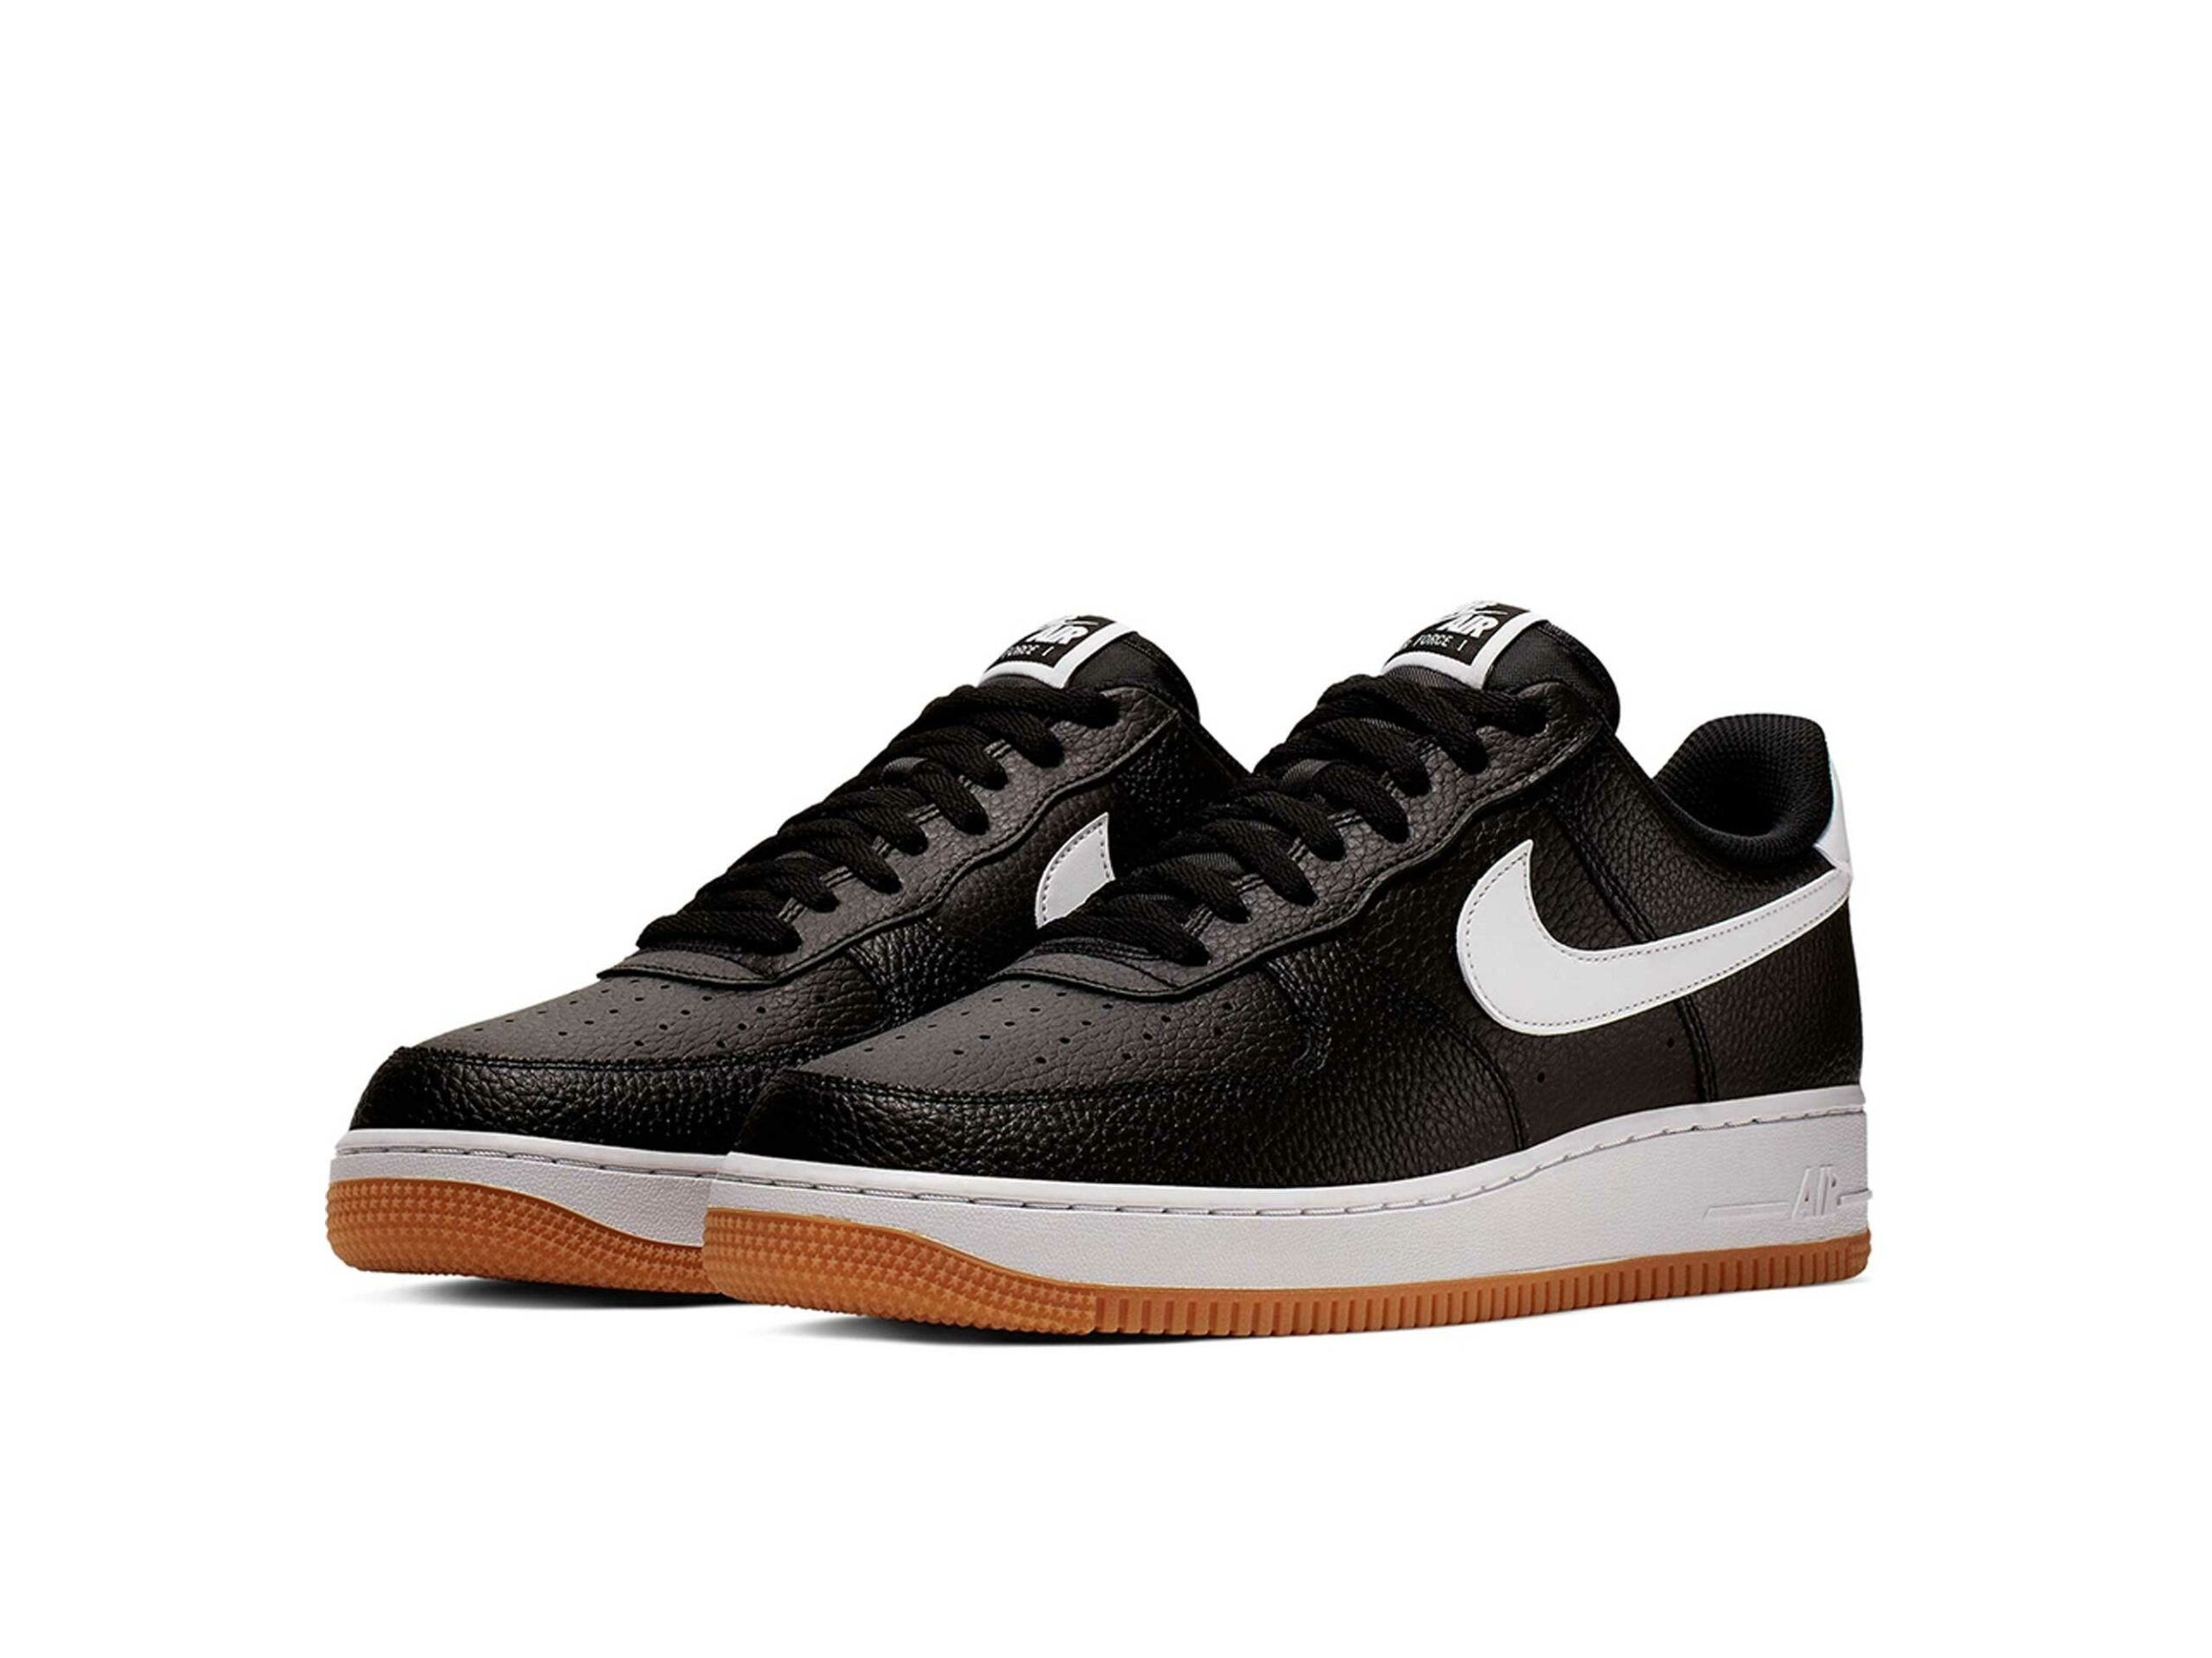 nike air force 1 07 black white ci0057_002 купить